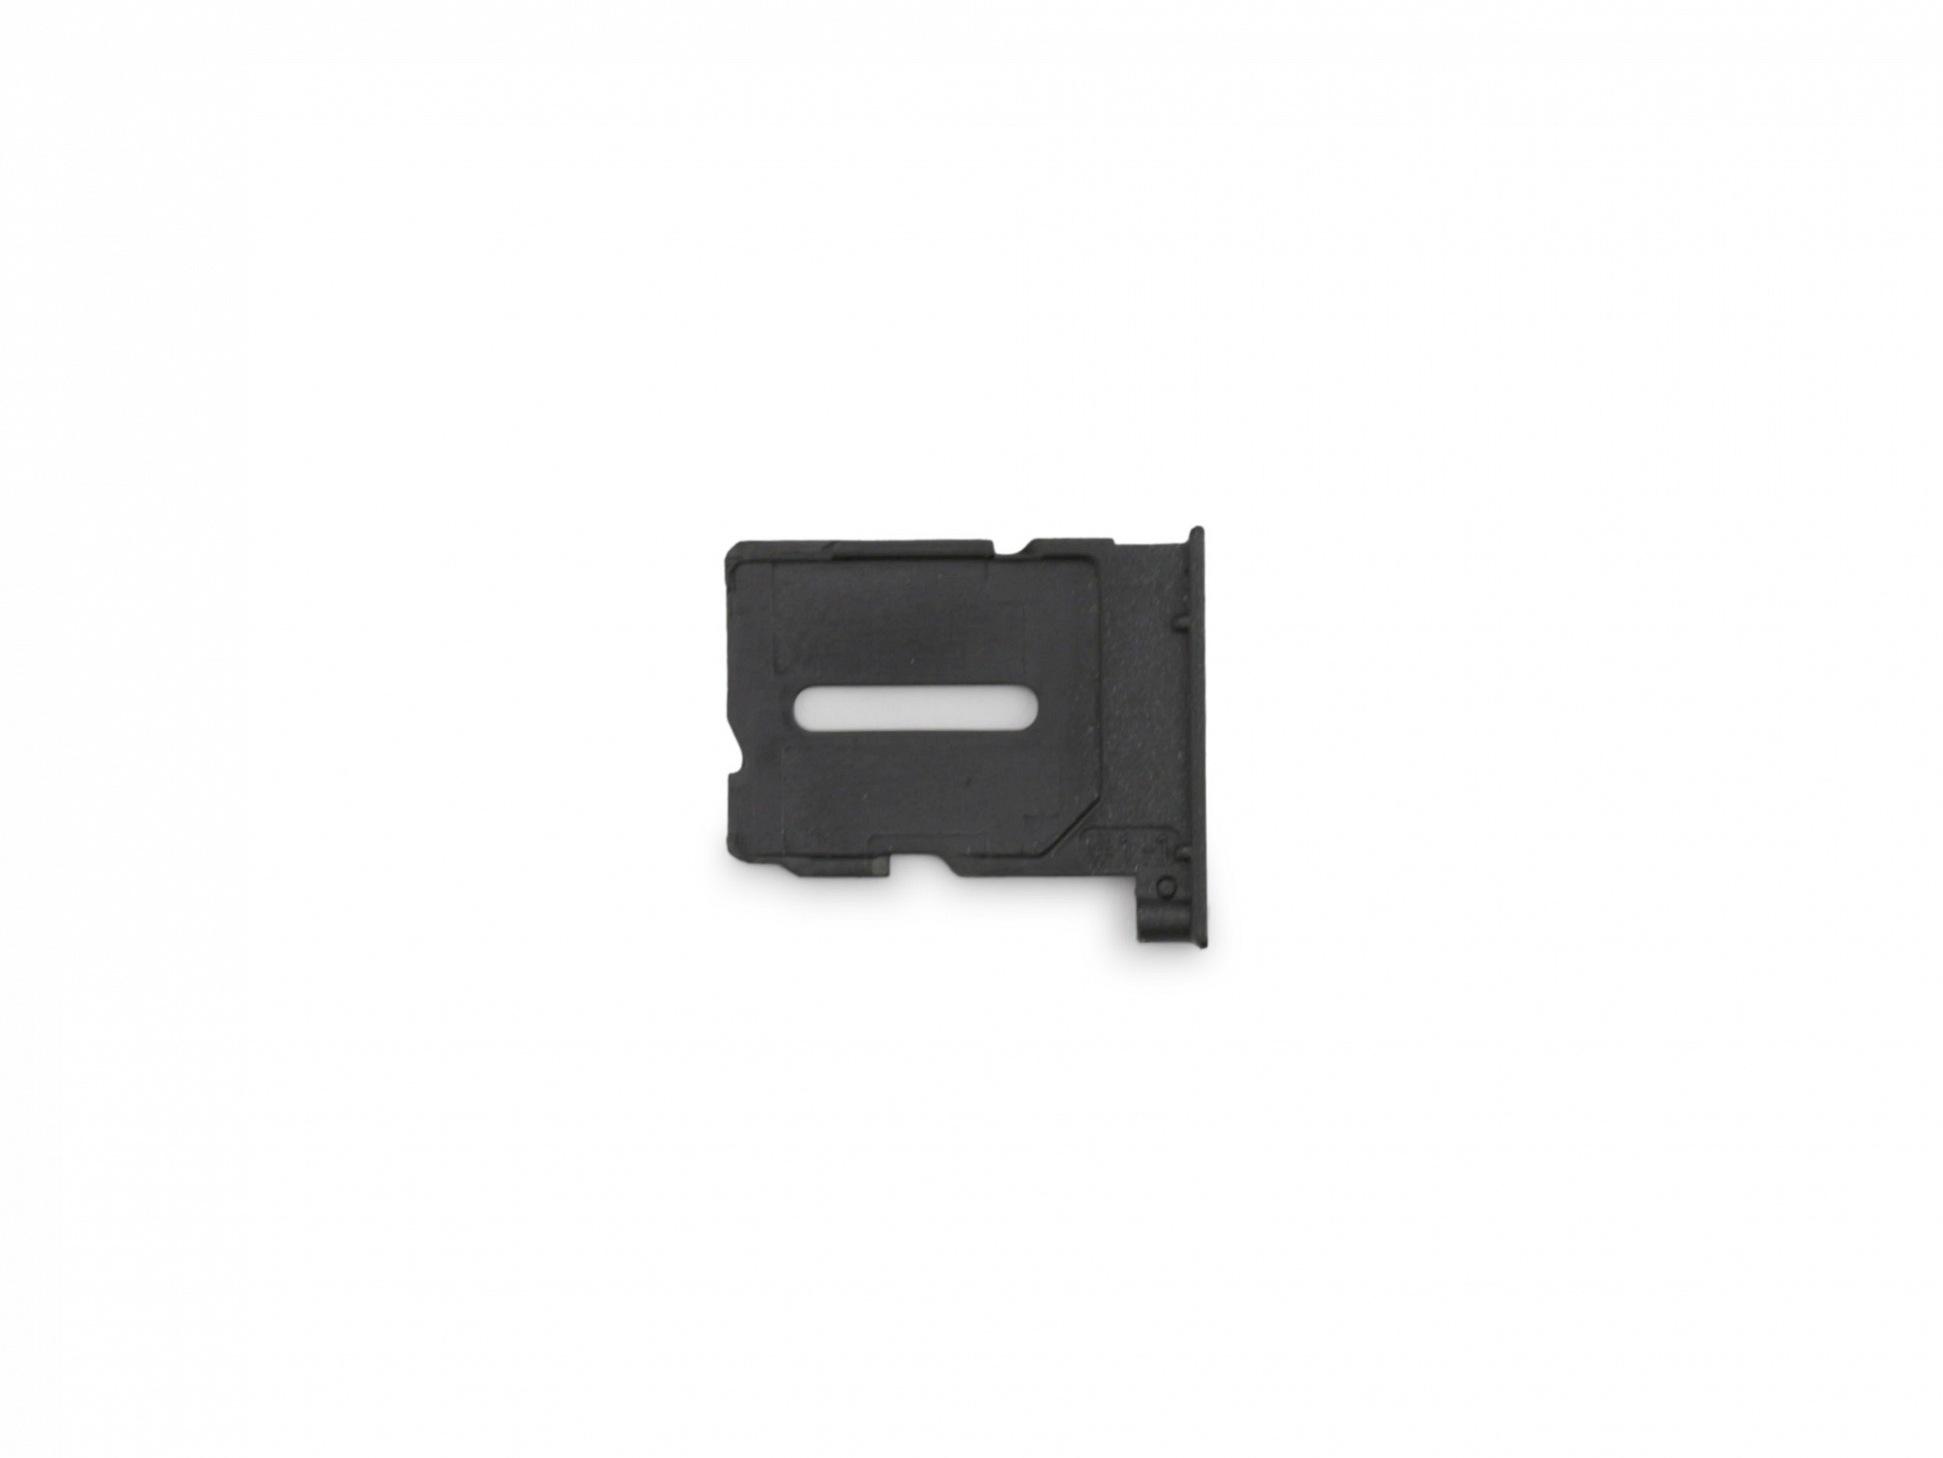 HRT470 SIM-Kartenhalter